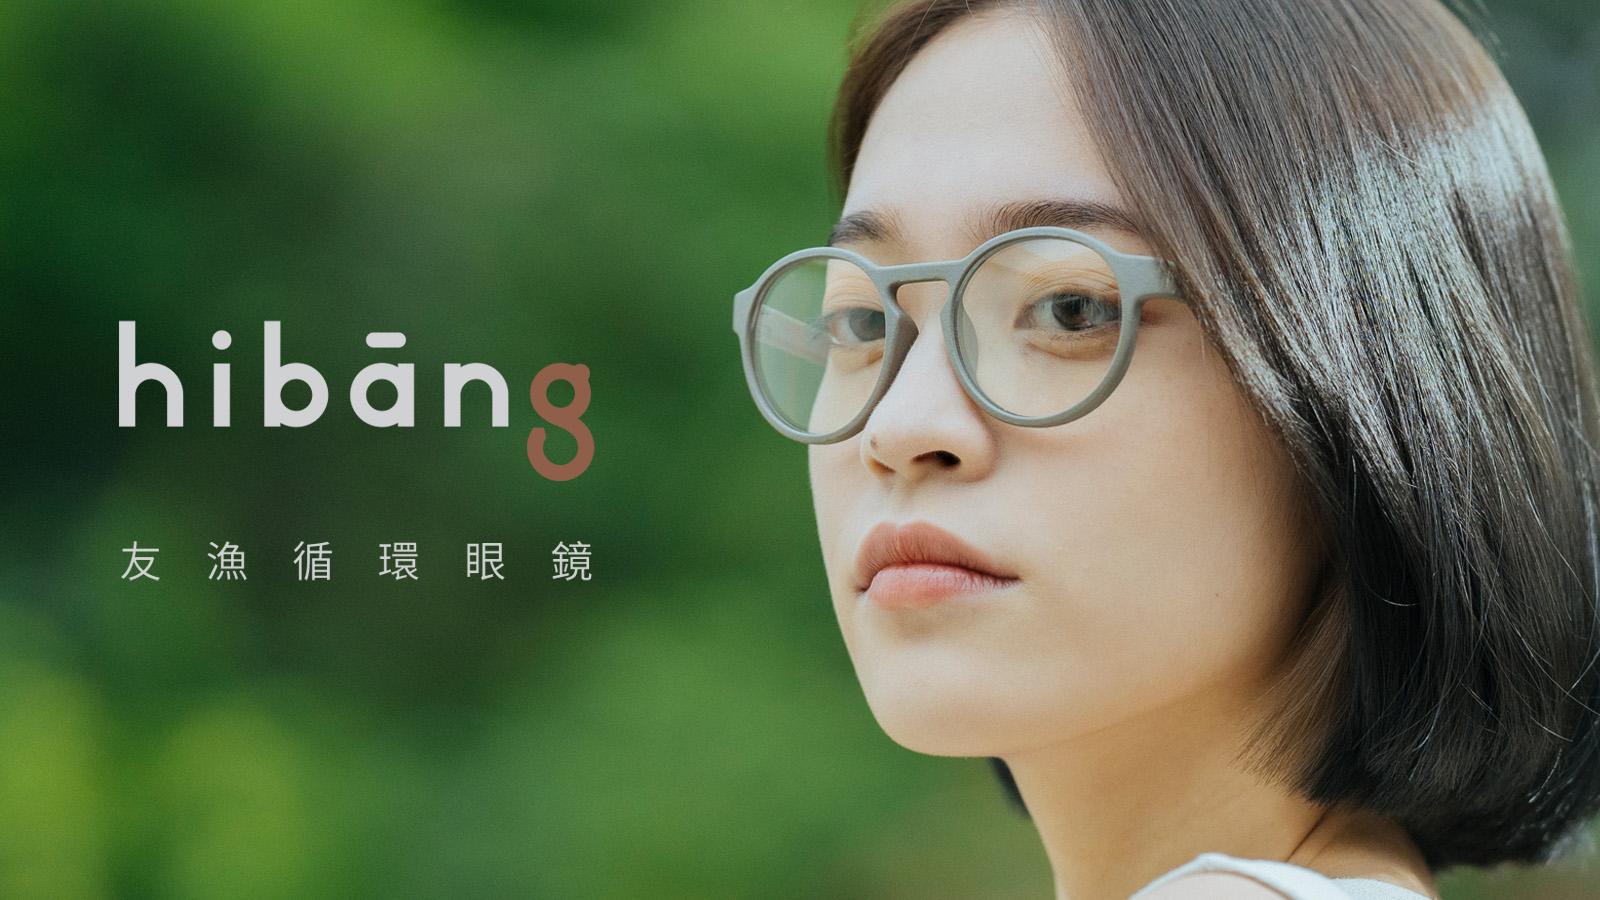 Hibāng 友漁循環眼鏡 世界第一支 100% 全循環眼鏡!獻給你與環境更體貼的新選擇